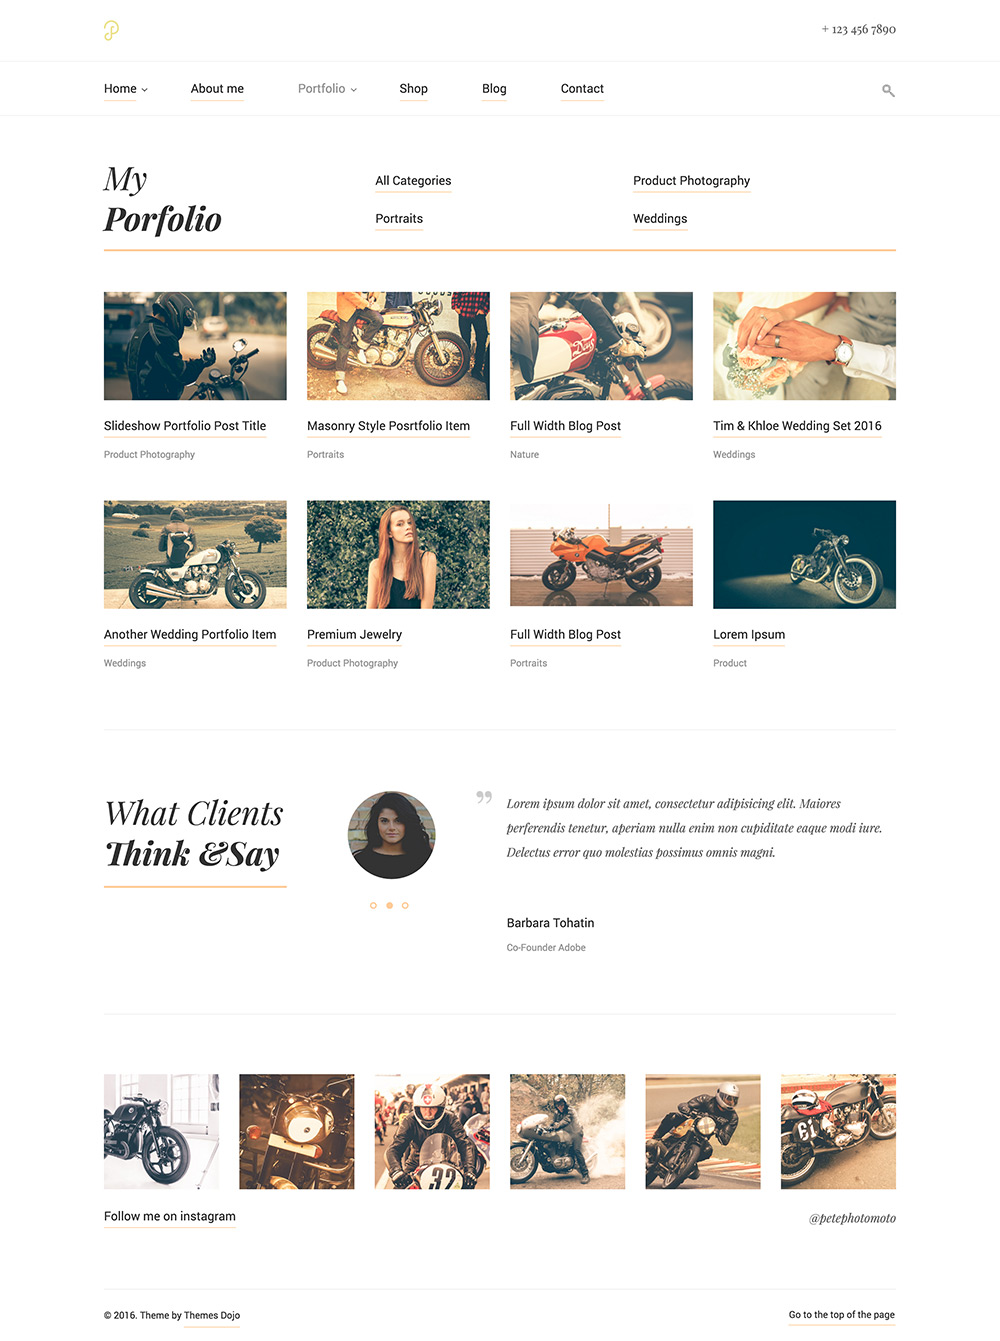 P Dojo - Photography & Portfolio Clean Minimalistic Site Template by ...